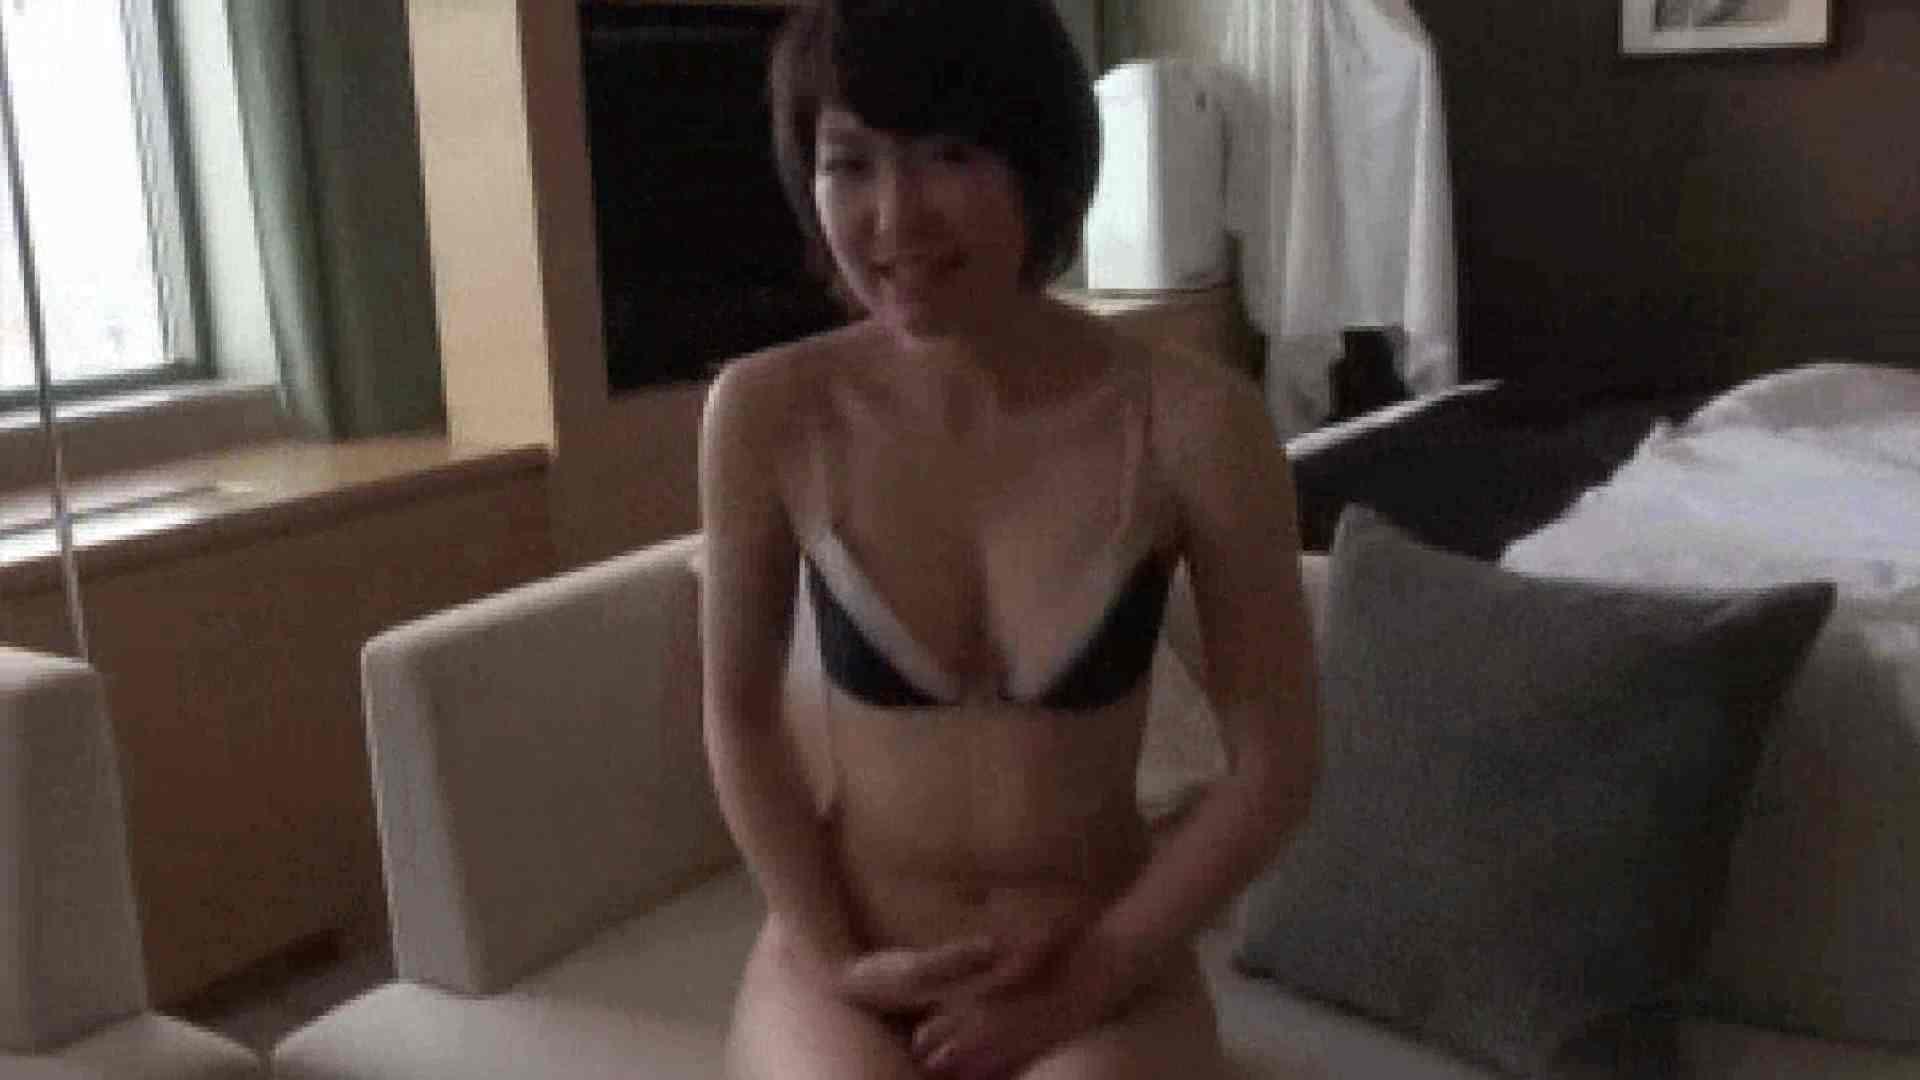 Hで可愛くてケシカラン! Vol.13 流出作品  54連発 14